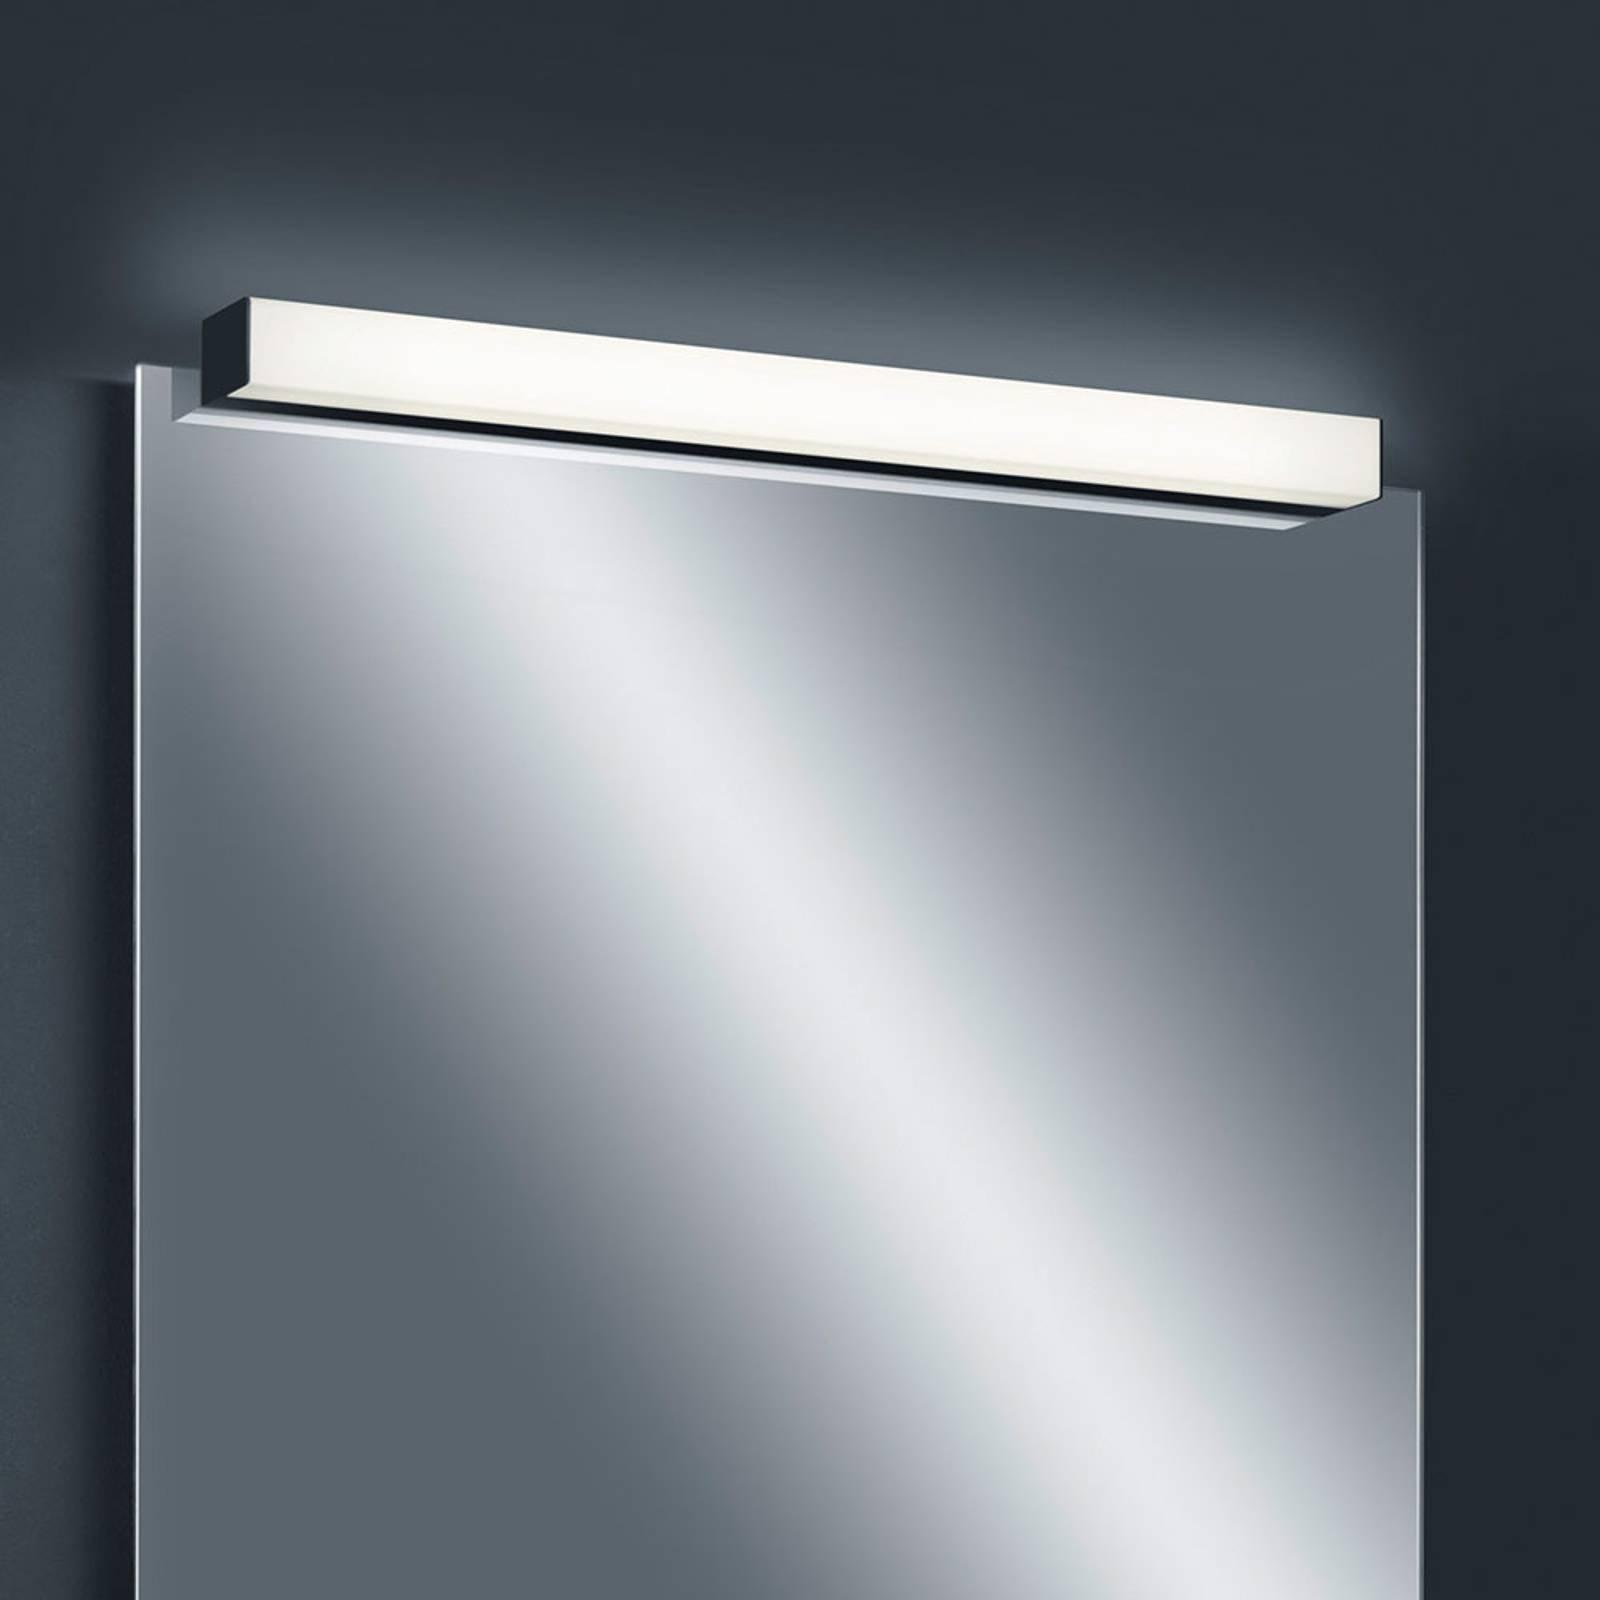 Helestra Lado LED-speillampe, svart, 90 cm